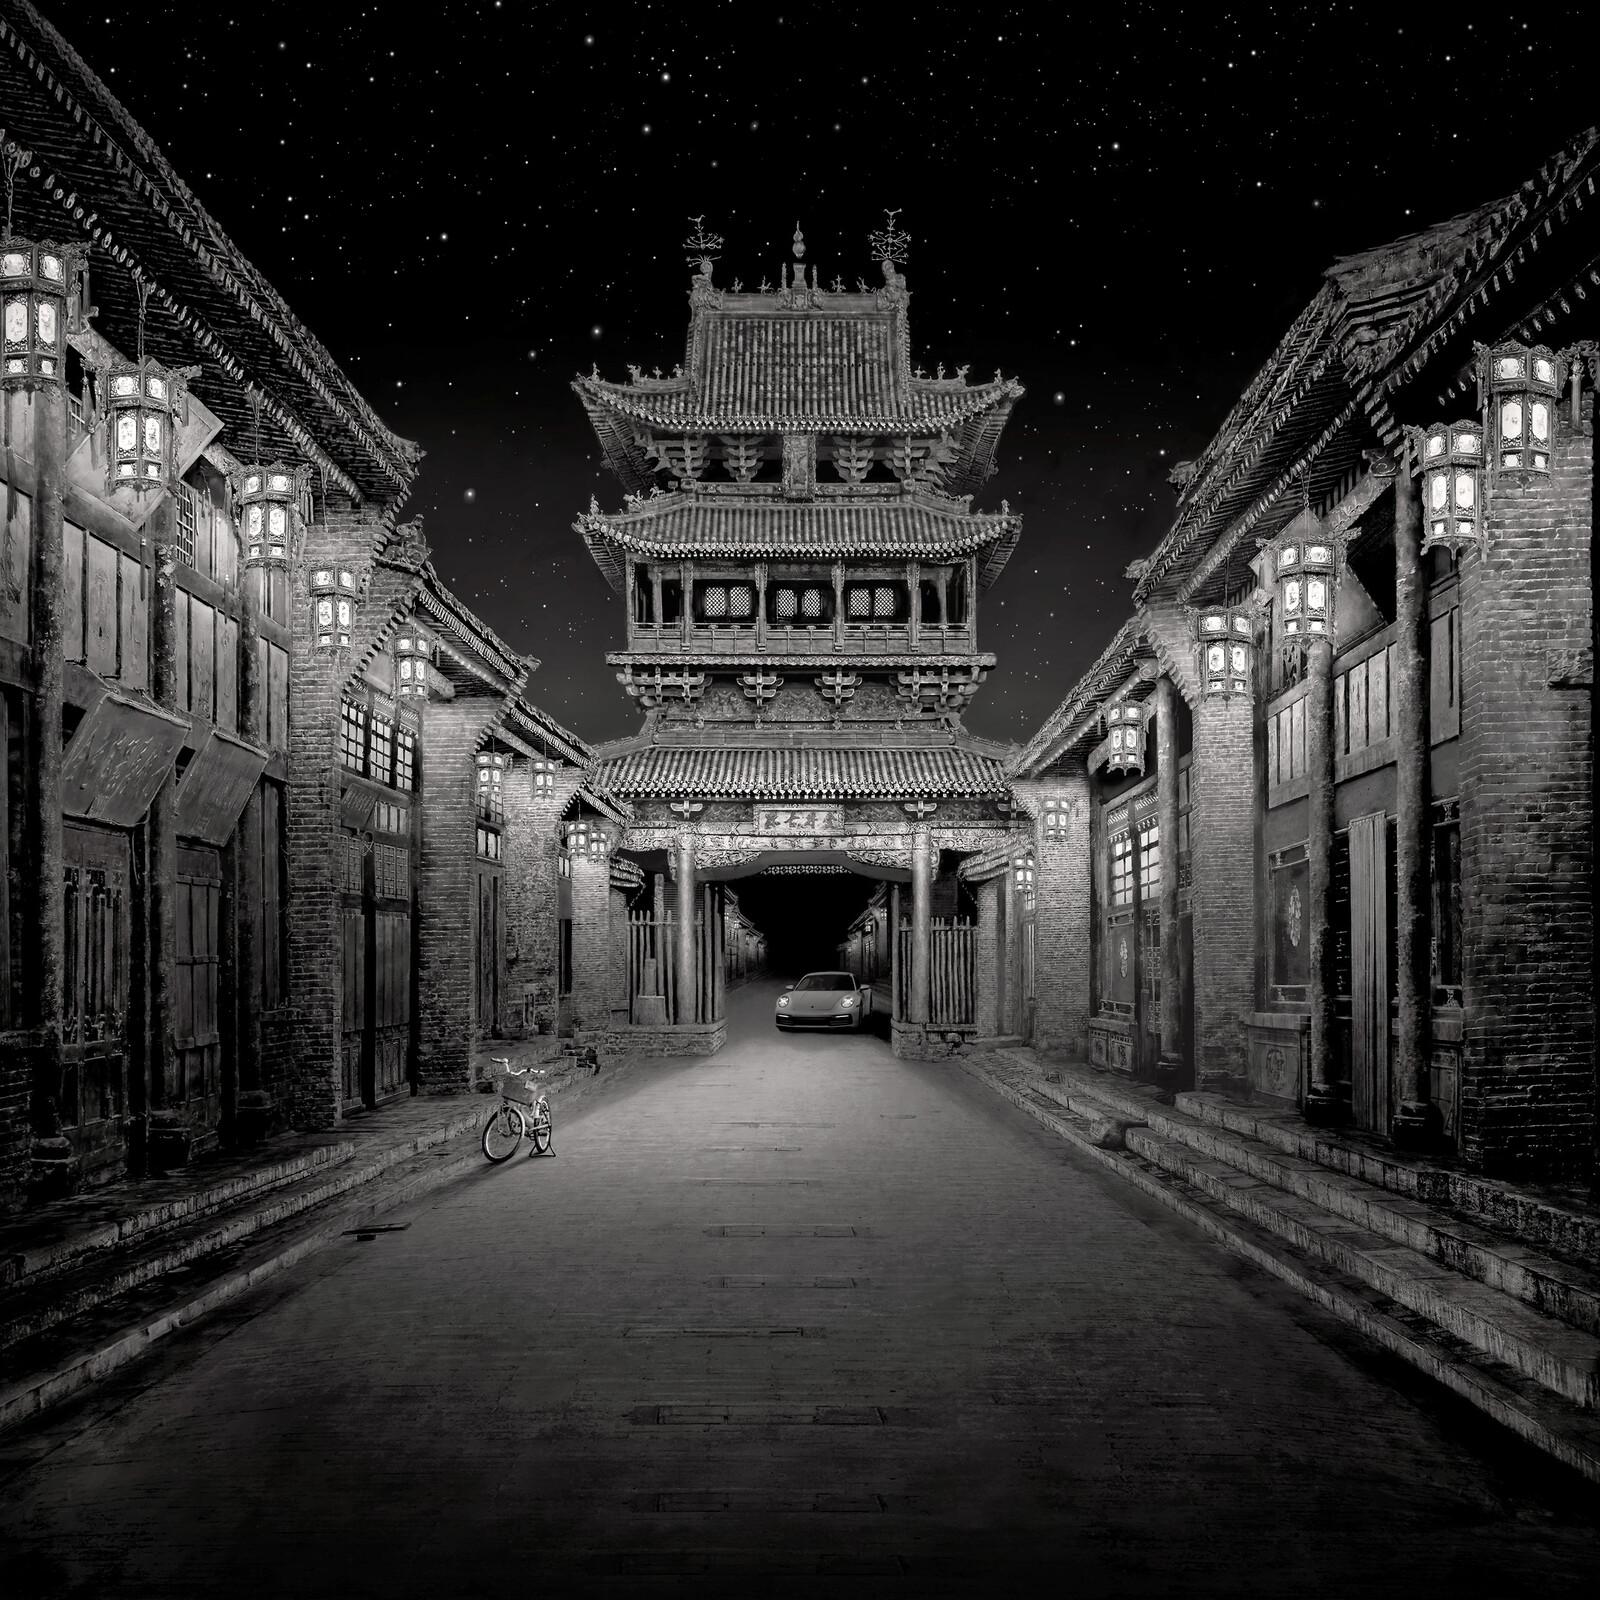 Secret Place, Timeless Machine - Irene Kung